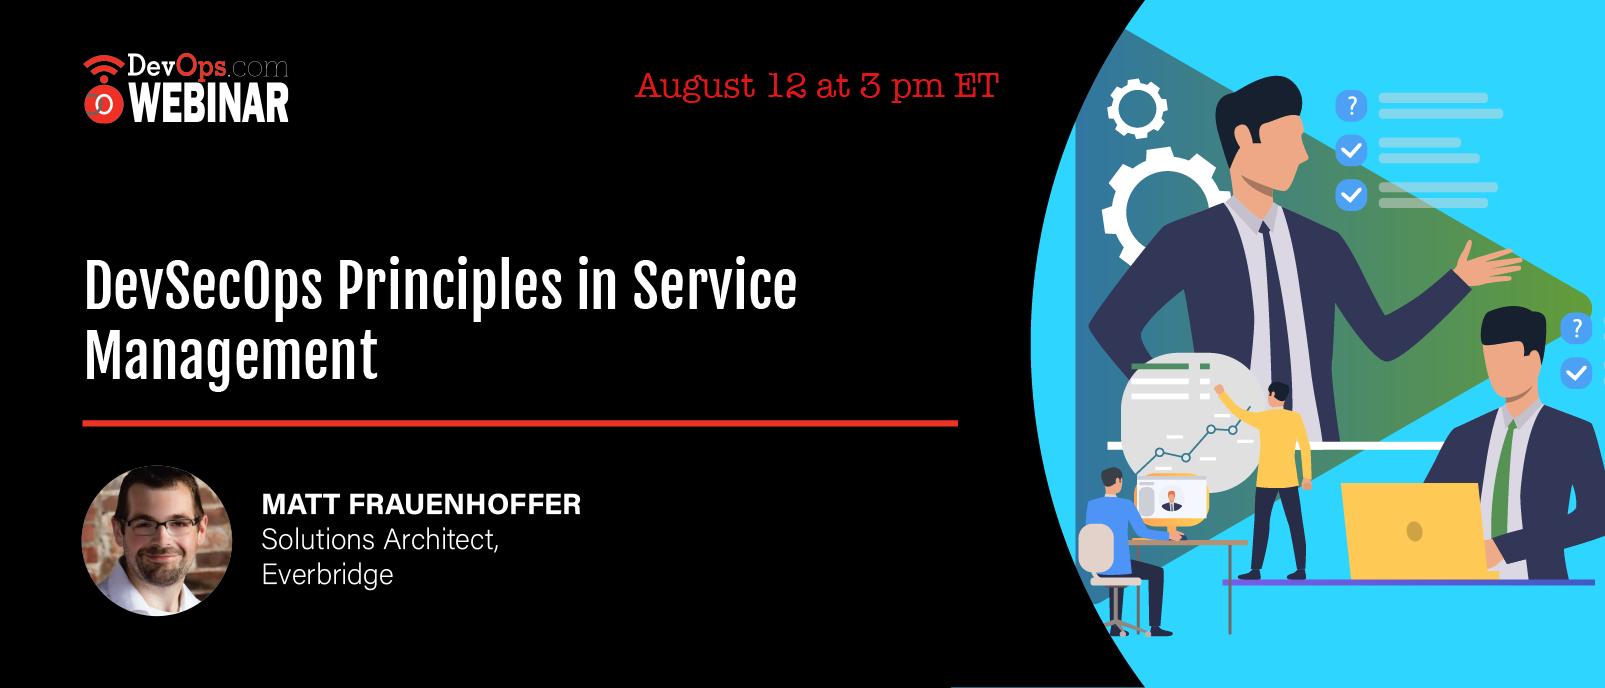 DevSecOps Principles in Service Management